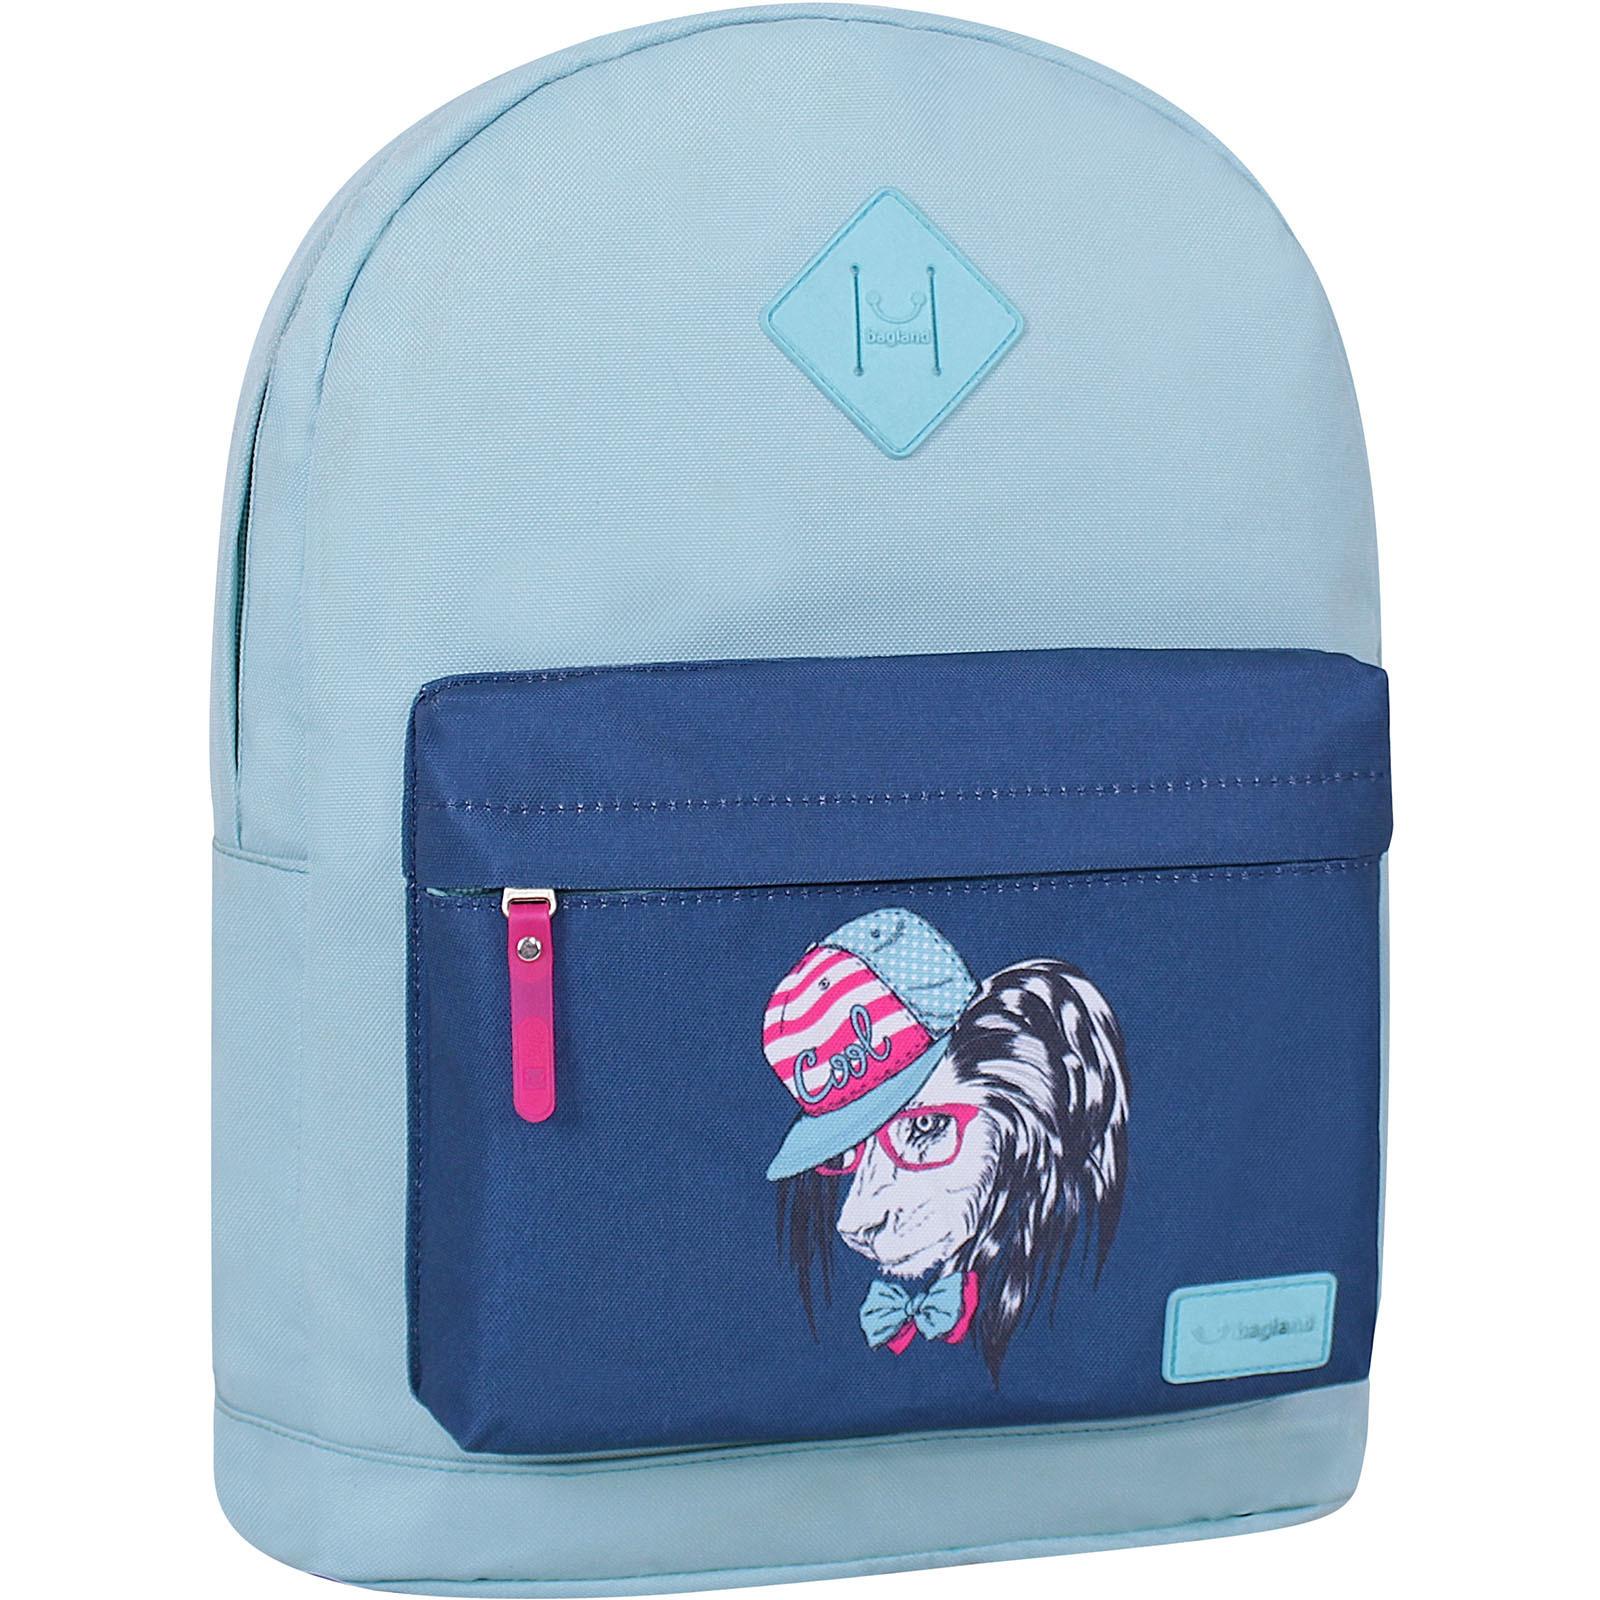 Молодежные рюкзаки Рюкзак Bagland Молодежный W/R 17 л. тиффани 180 (00533662) IMG_9500_суб.180_.JPG